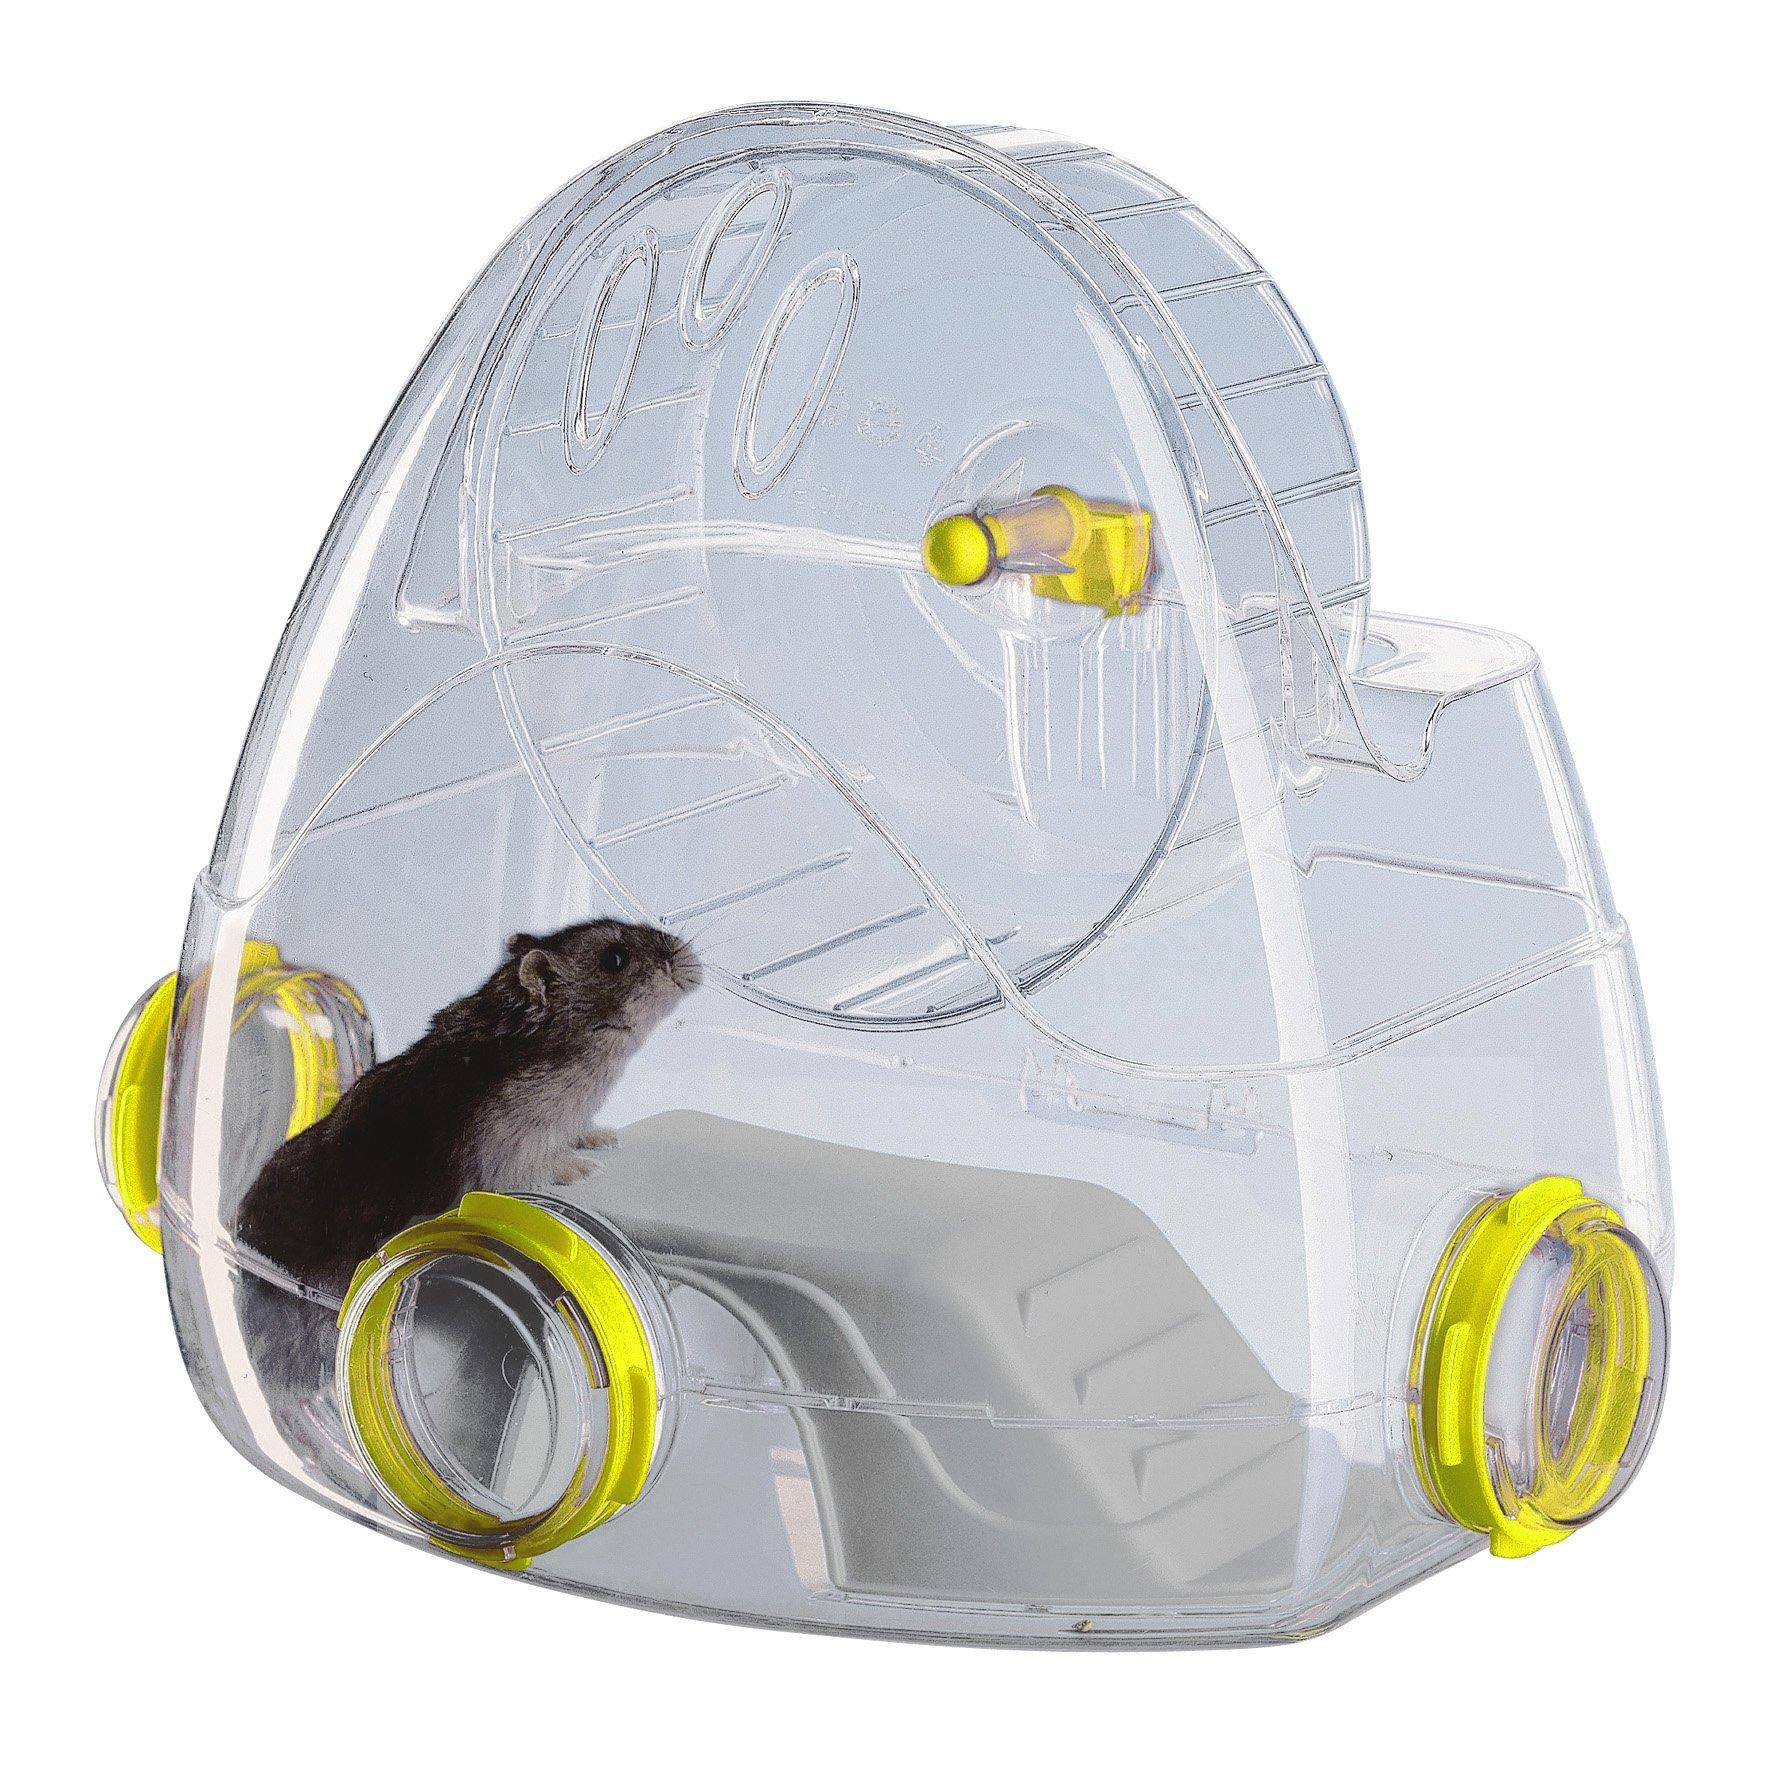 Ferplast FPI 4824 Hamster Gym